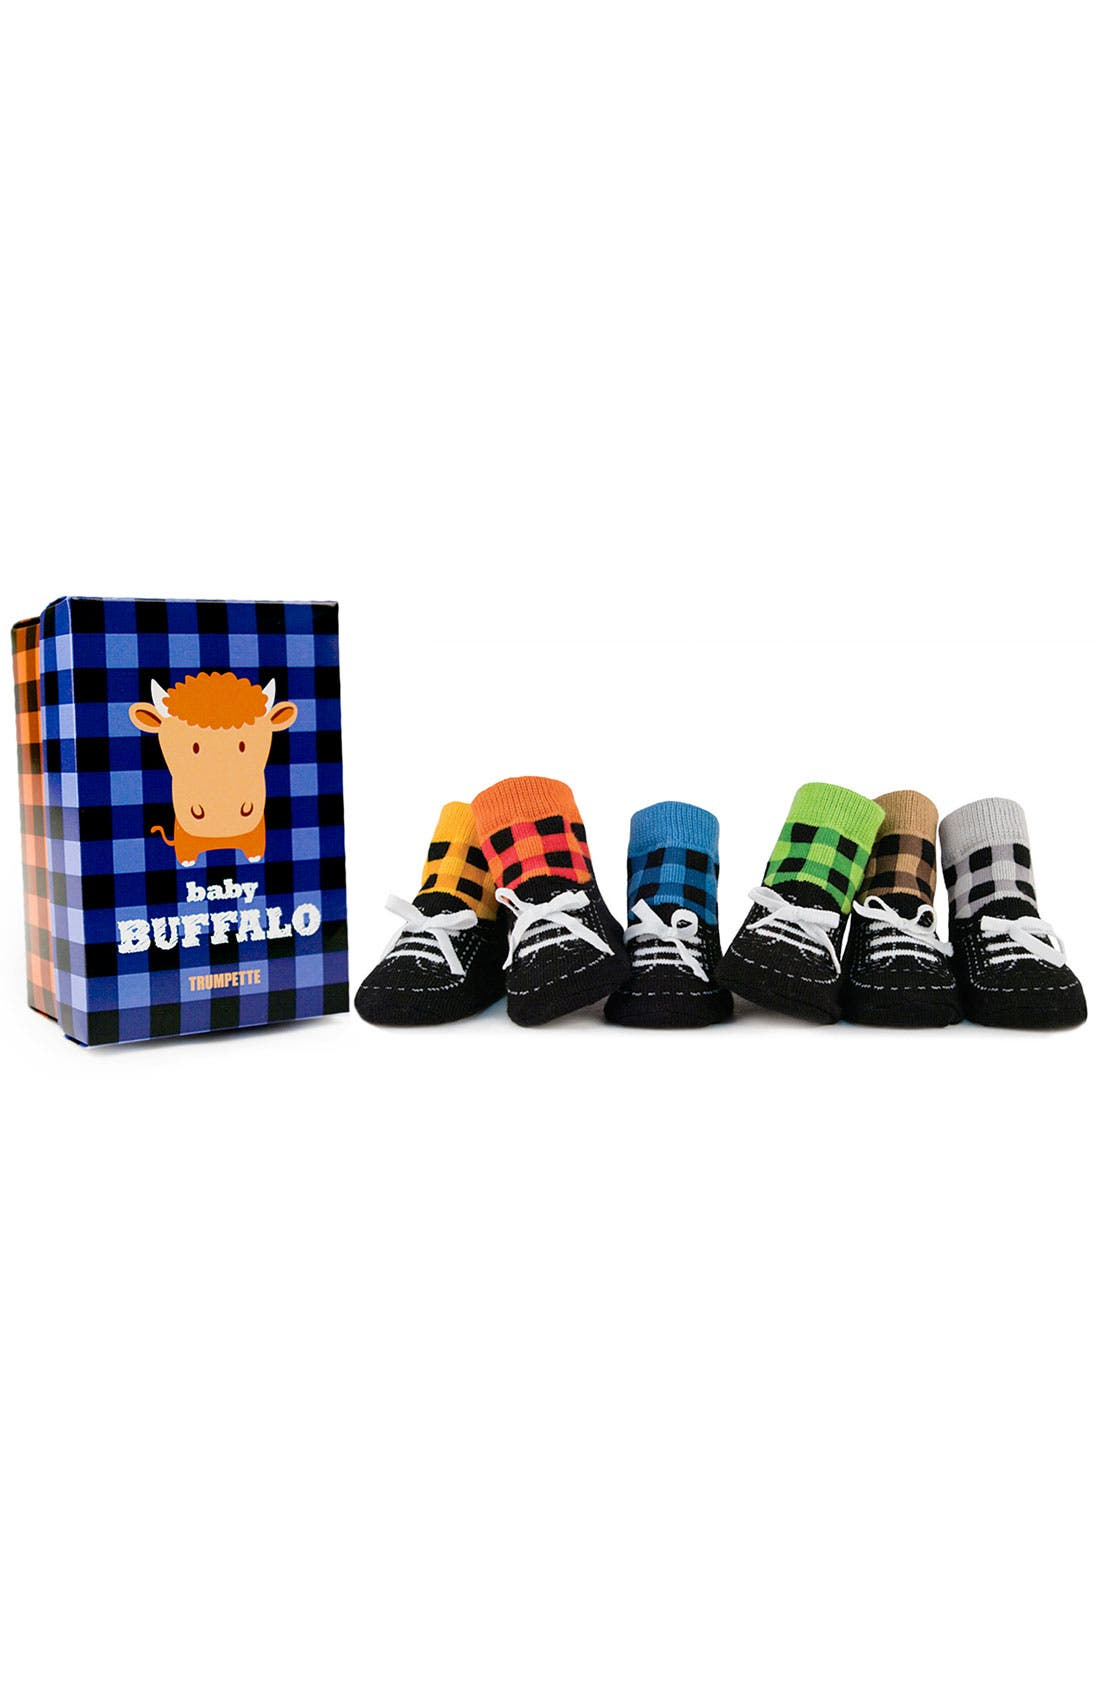 Main Image - Trumpette 'Baby Buffalo' Socks (6-Pack) (Infant)